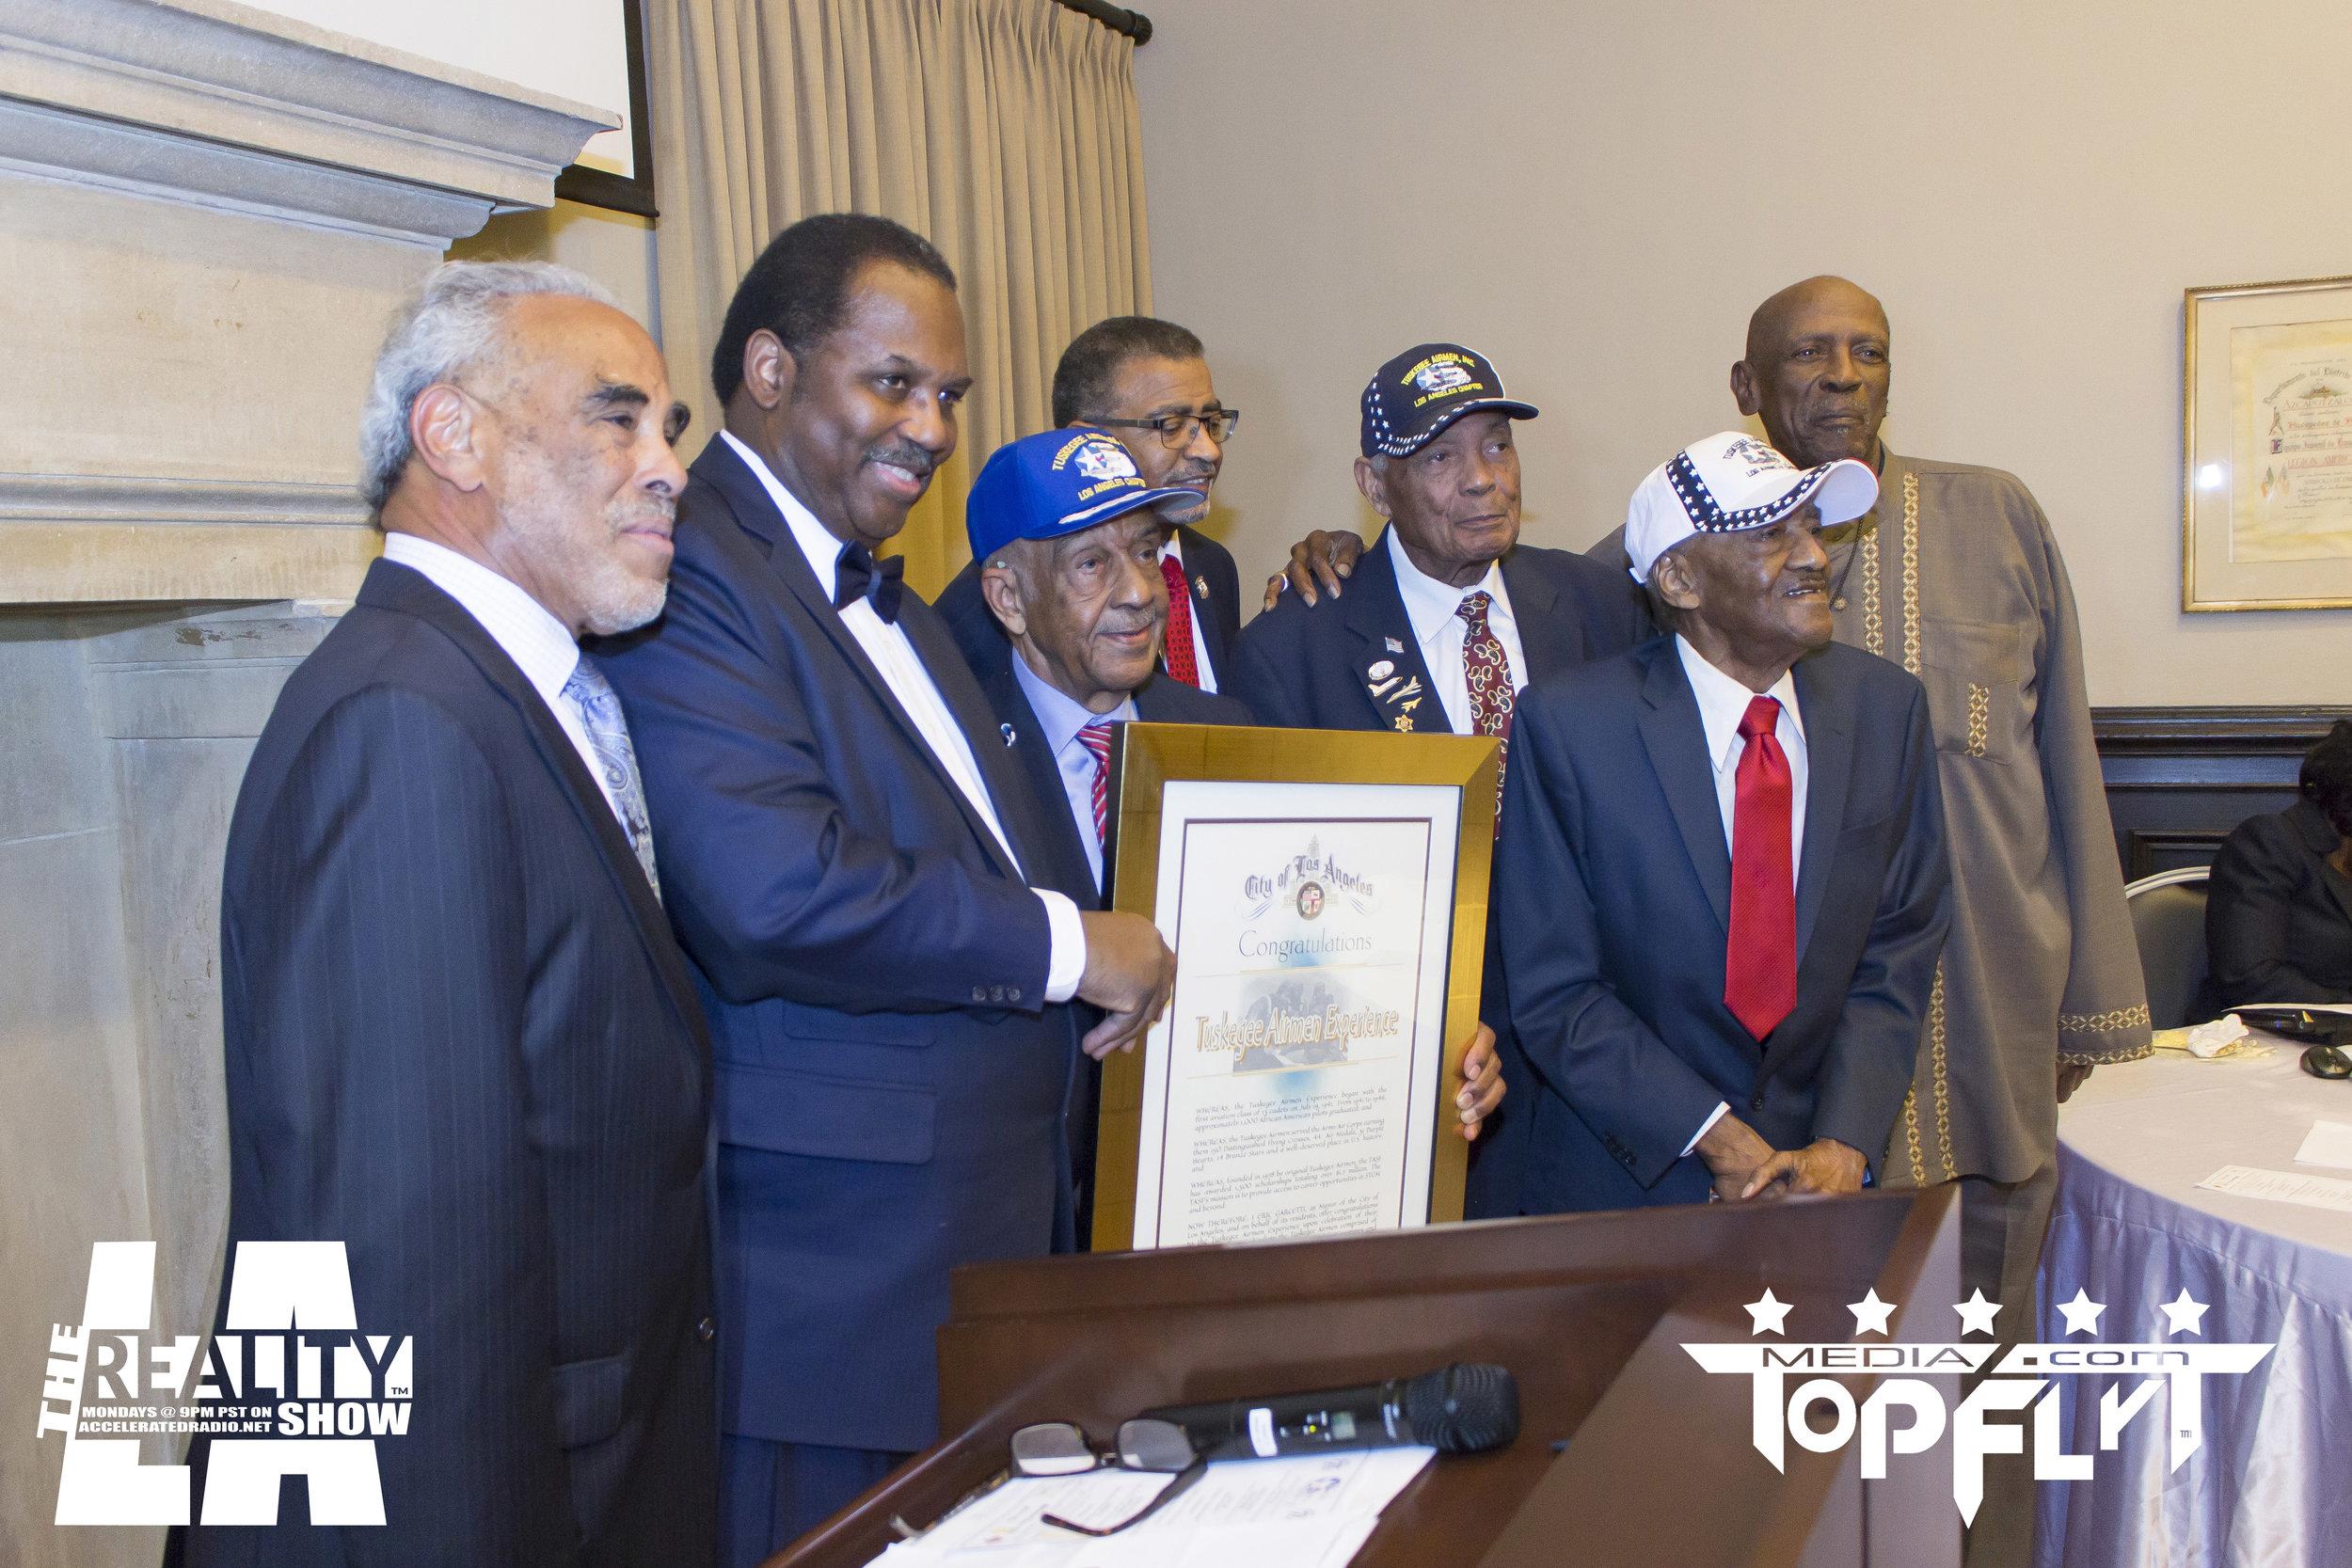 The Reality Show LA - Tuskegee Airmen 75th Anniversary VIP Reception_127.jpg